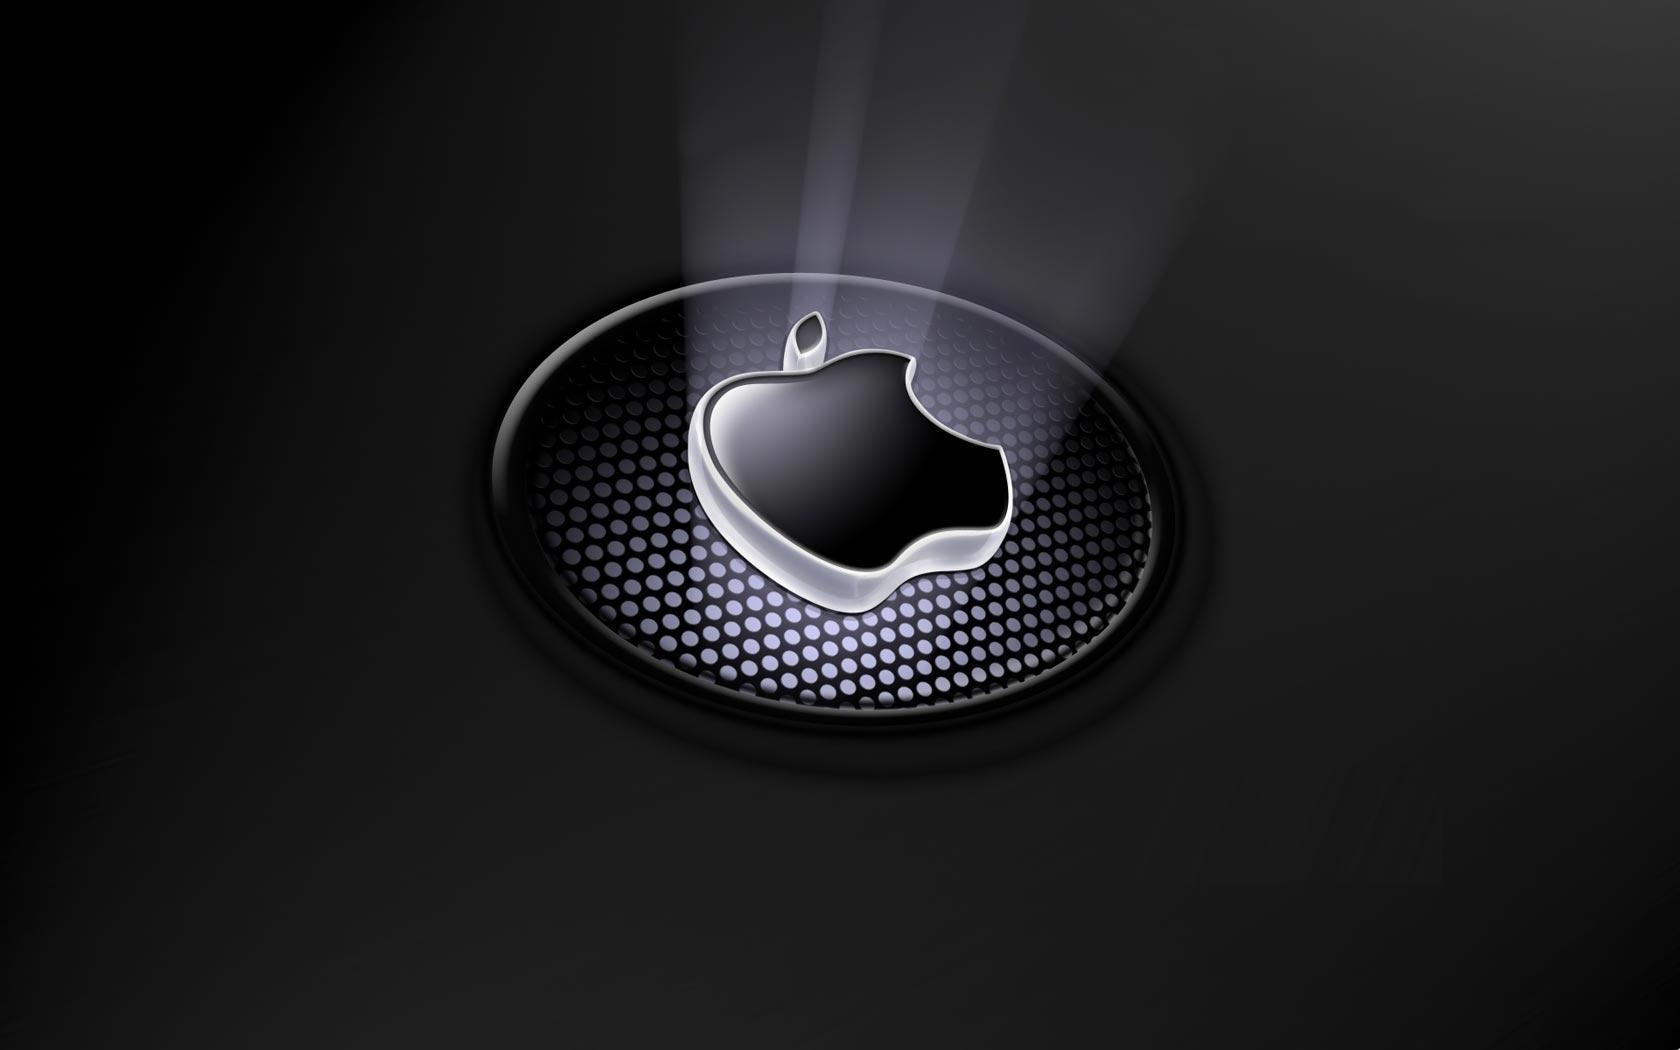 apple logo hd wallpapers group (77+)